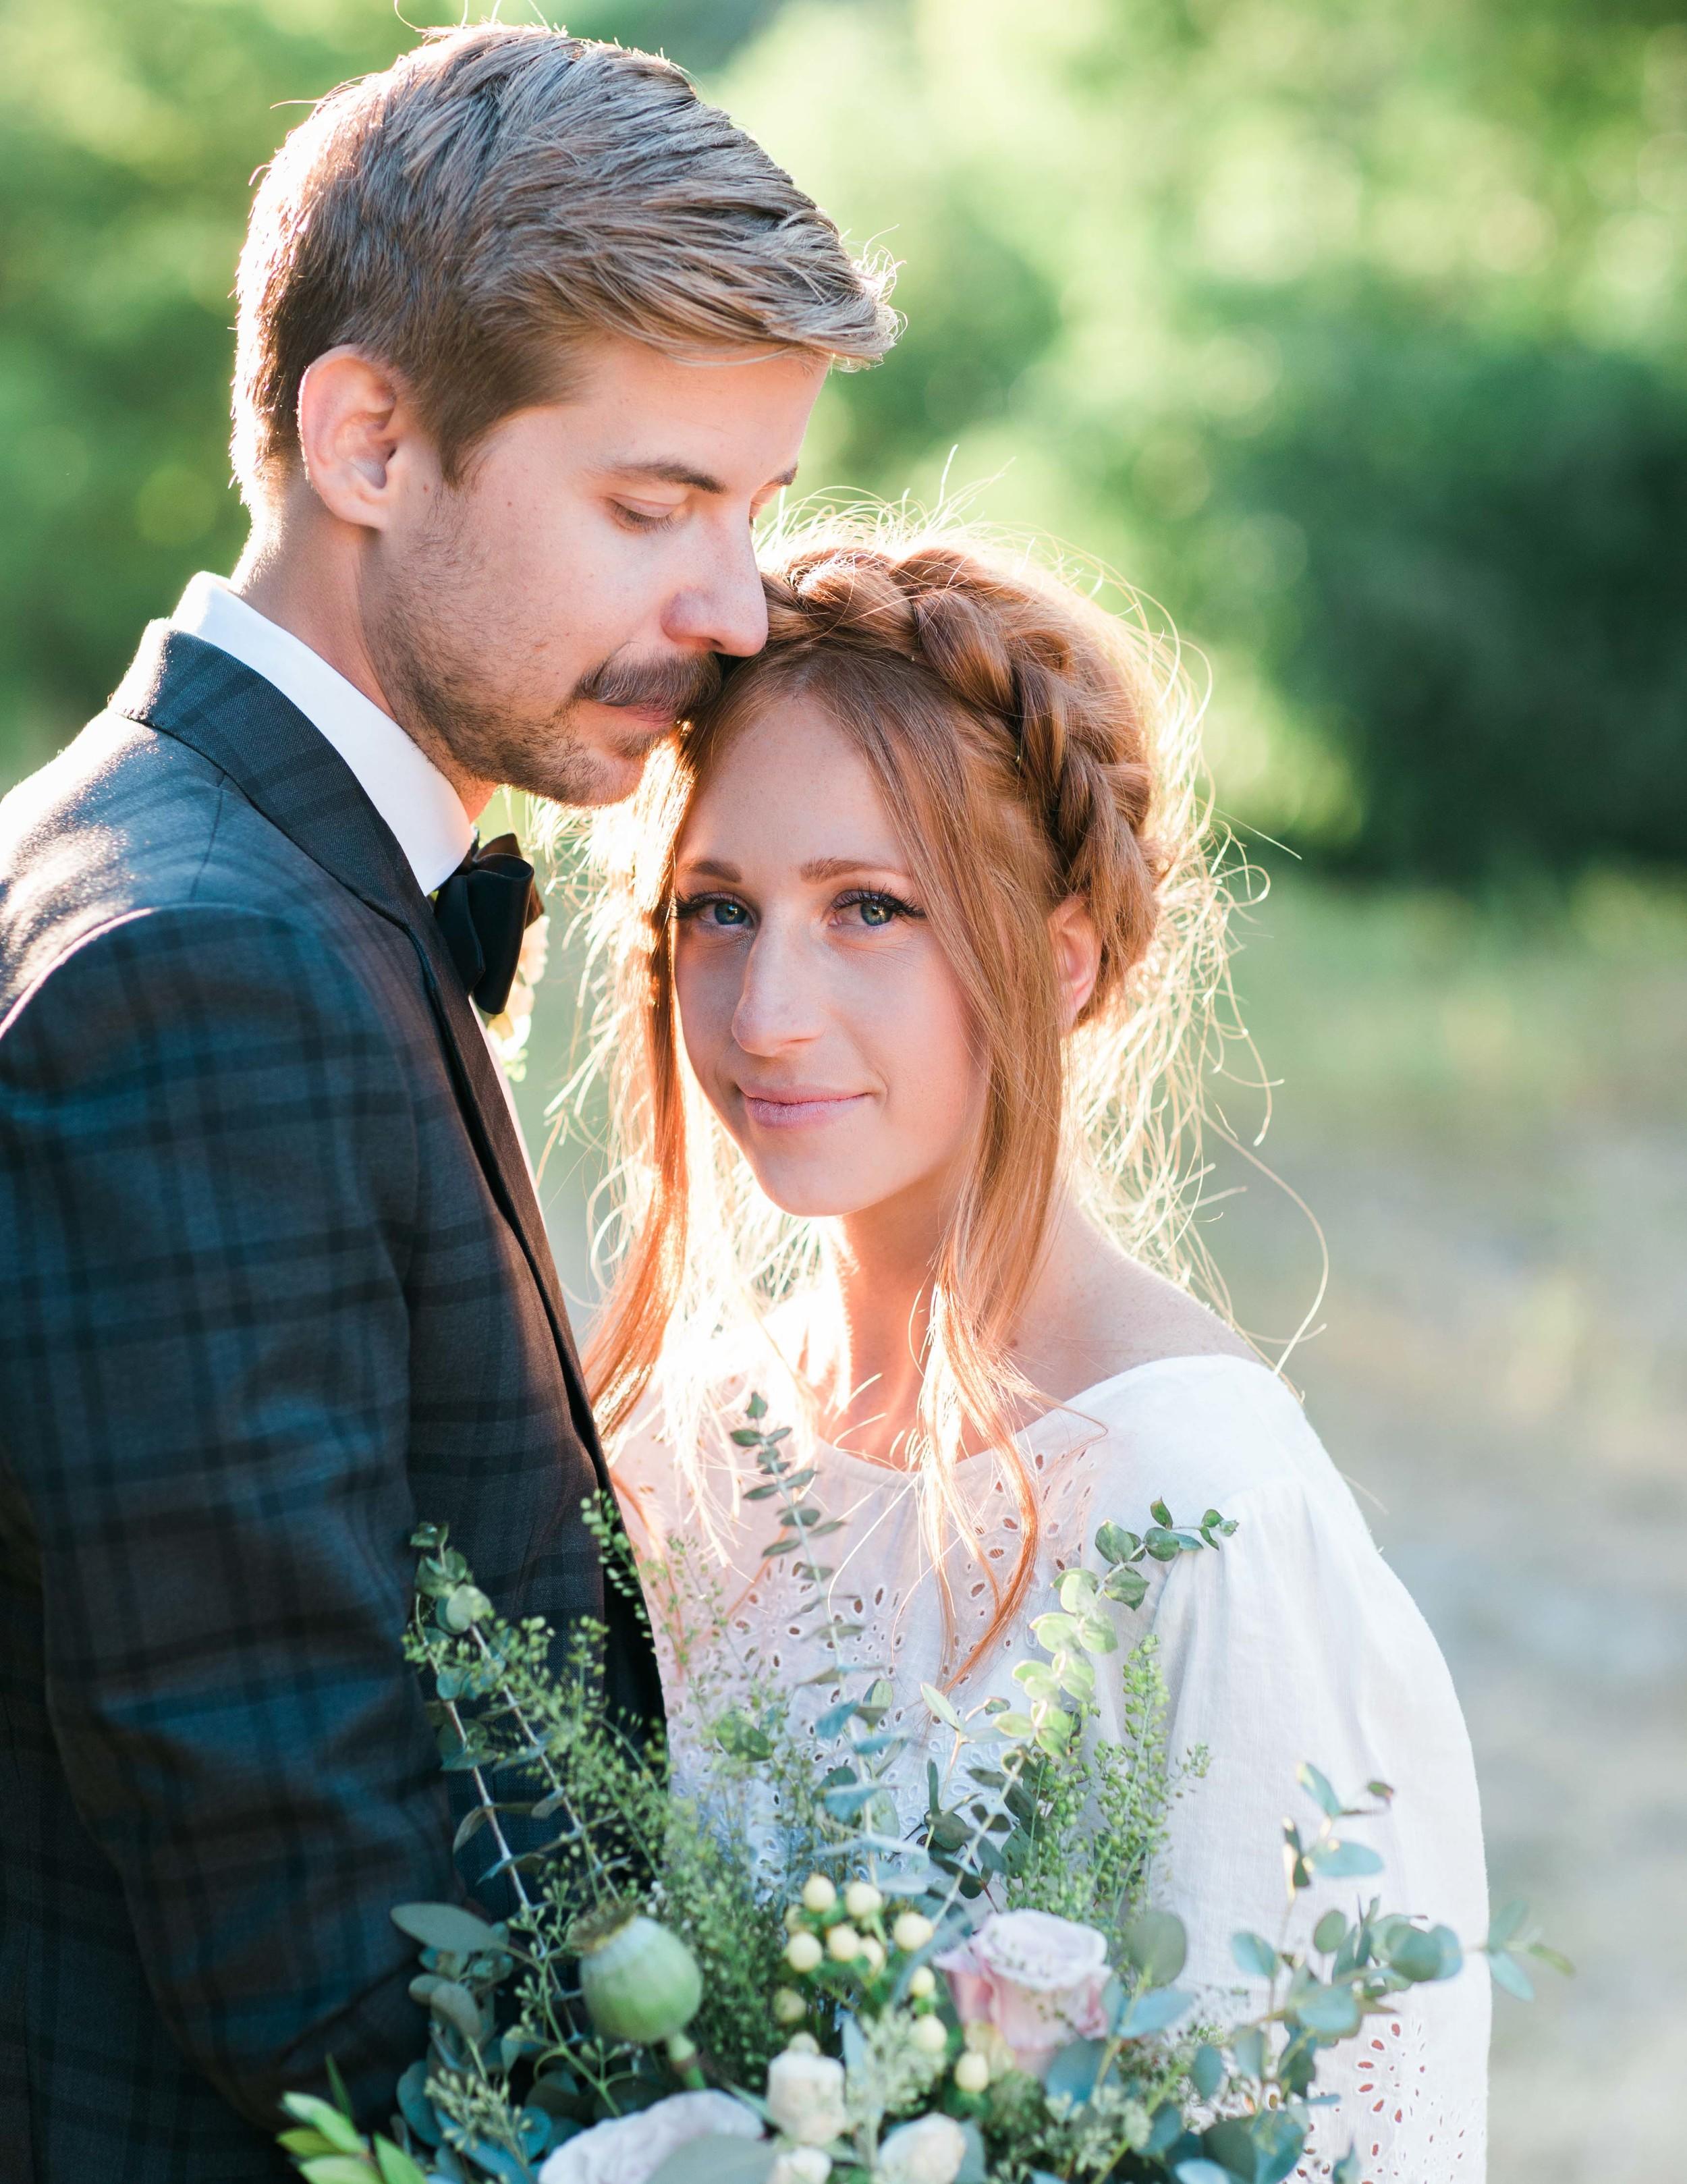 Salt-Lake-City-Utah-Wedding-Photographer-5.jpg